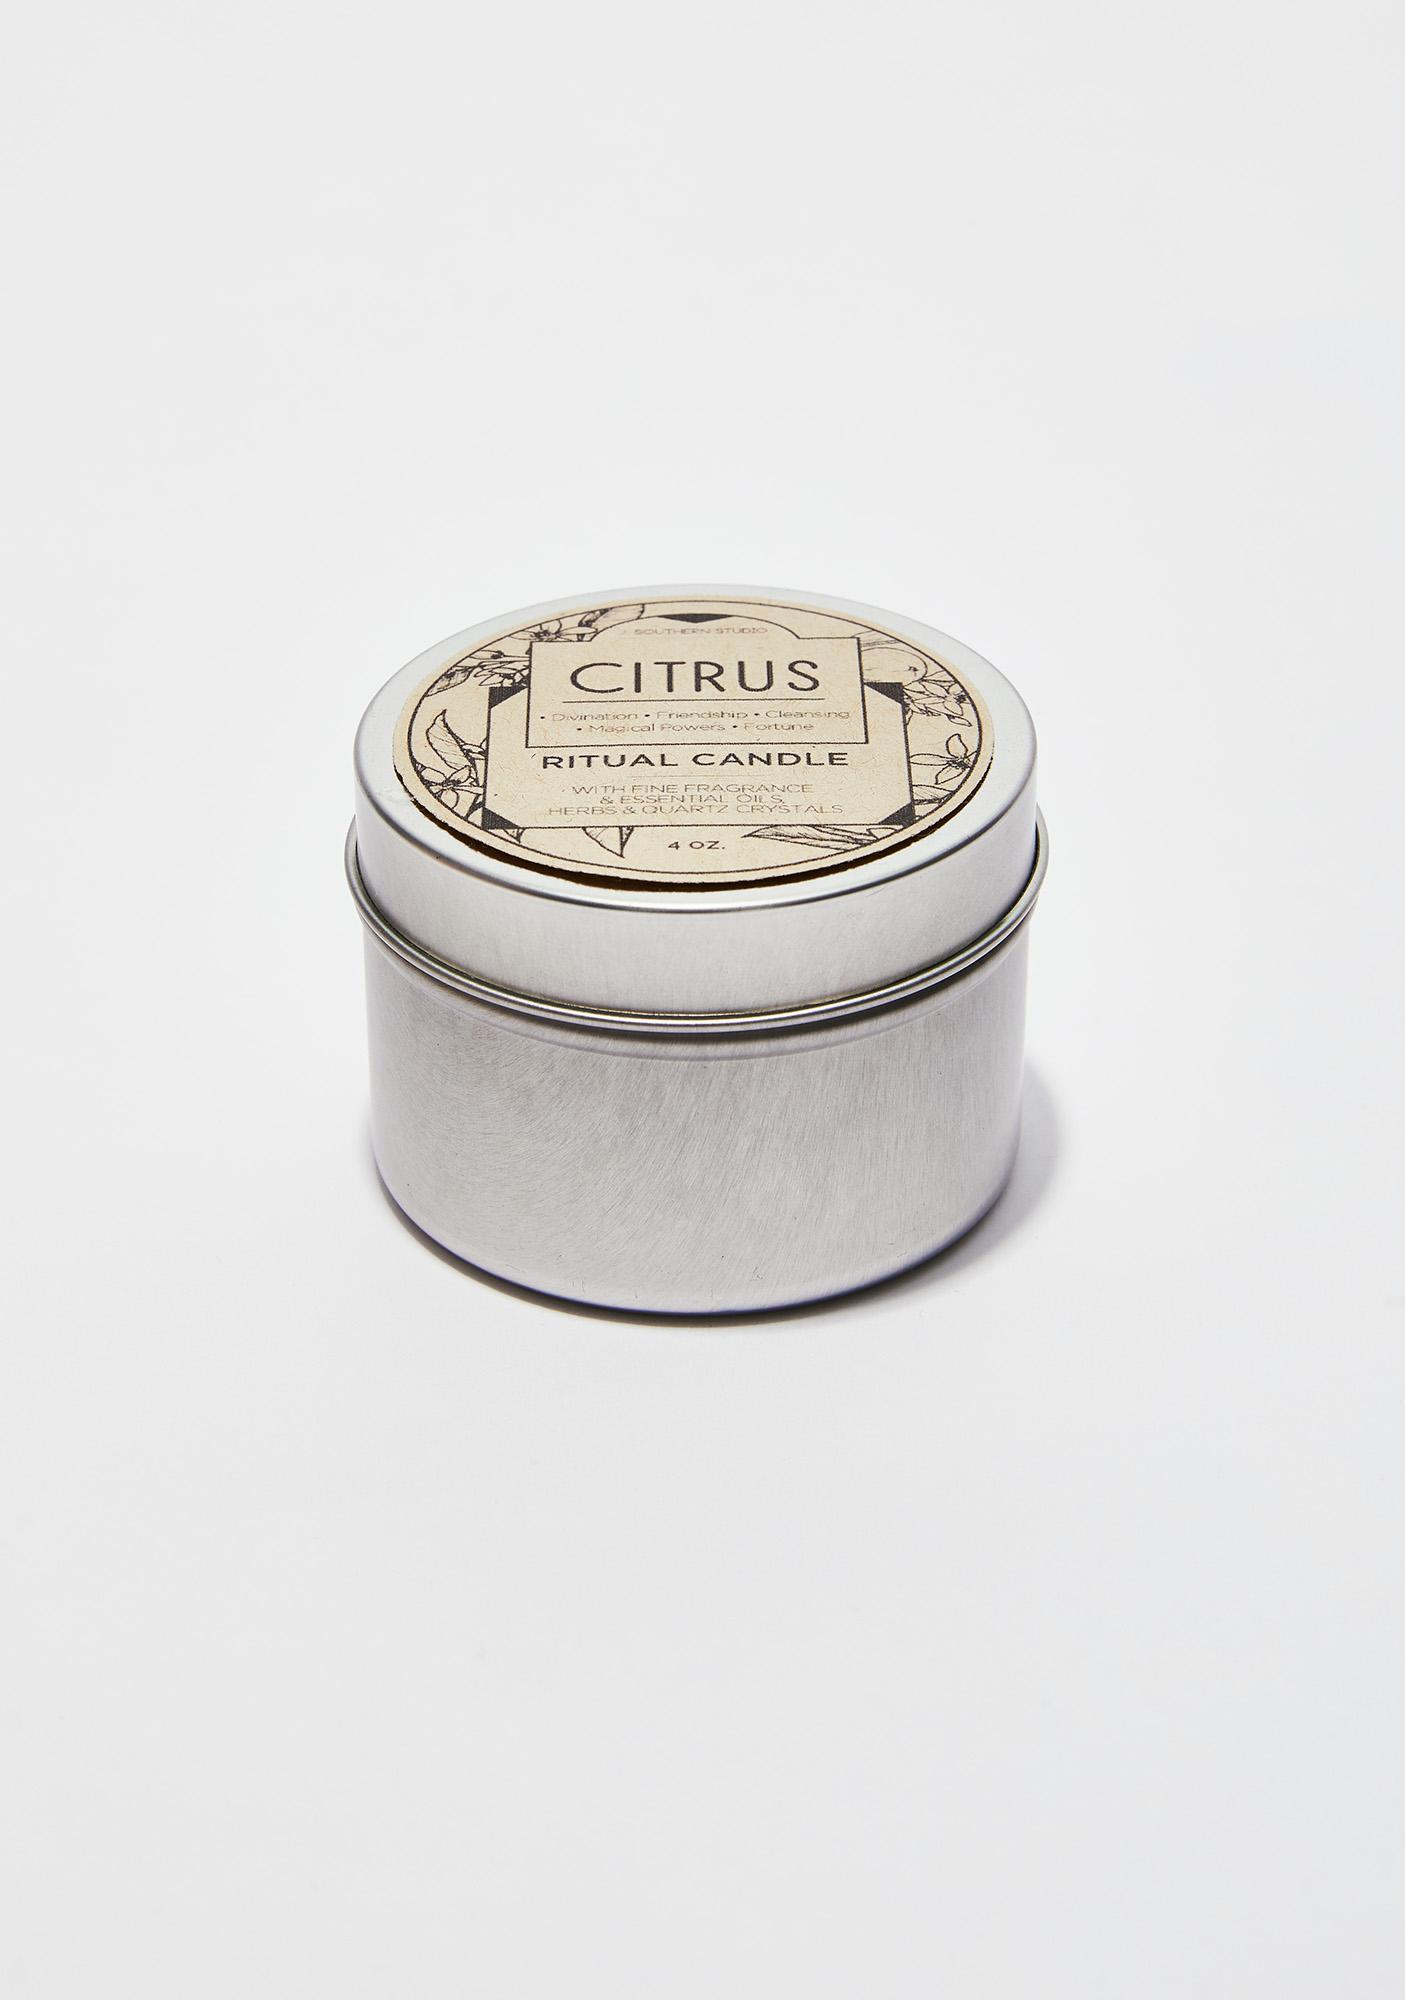 J. SOUTHERN STUDIO Citrus Ritual Candle